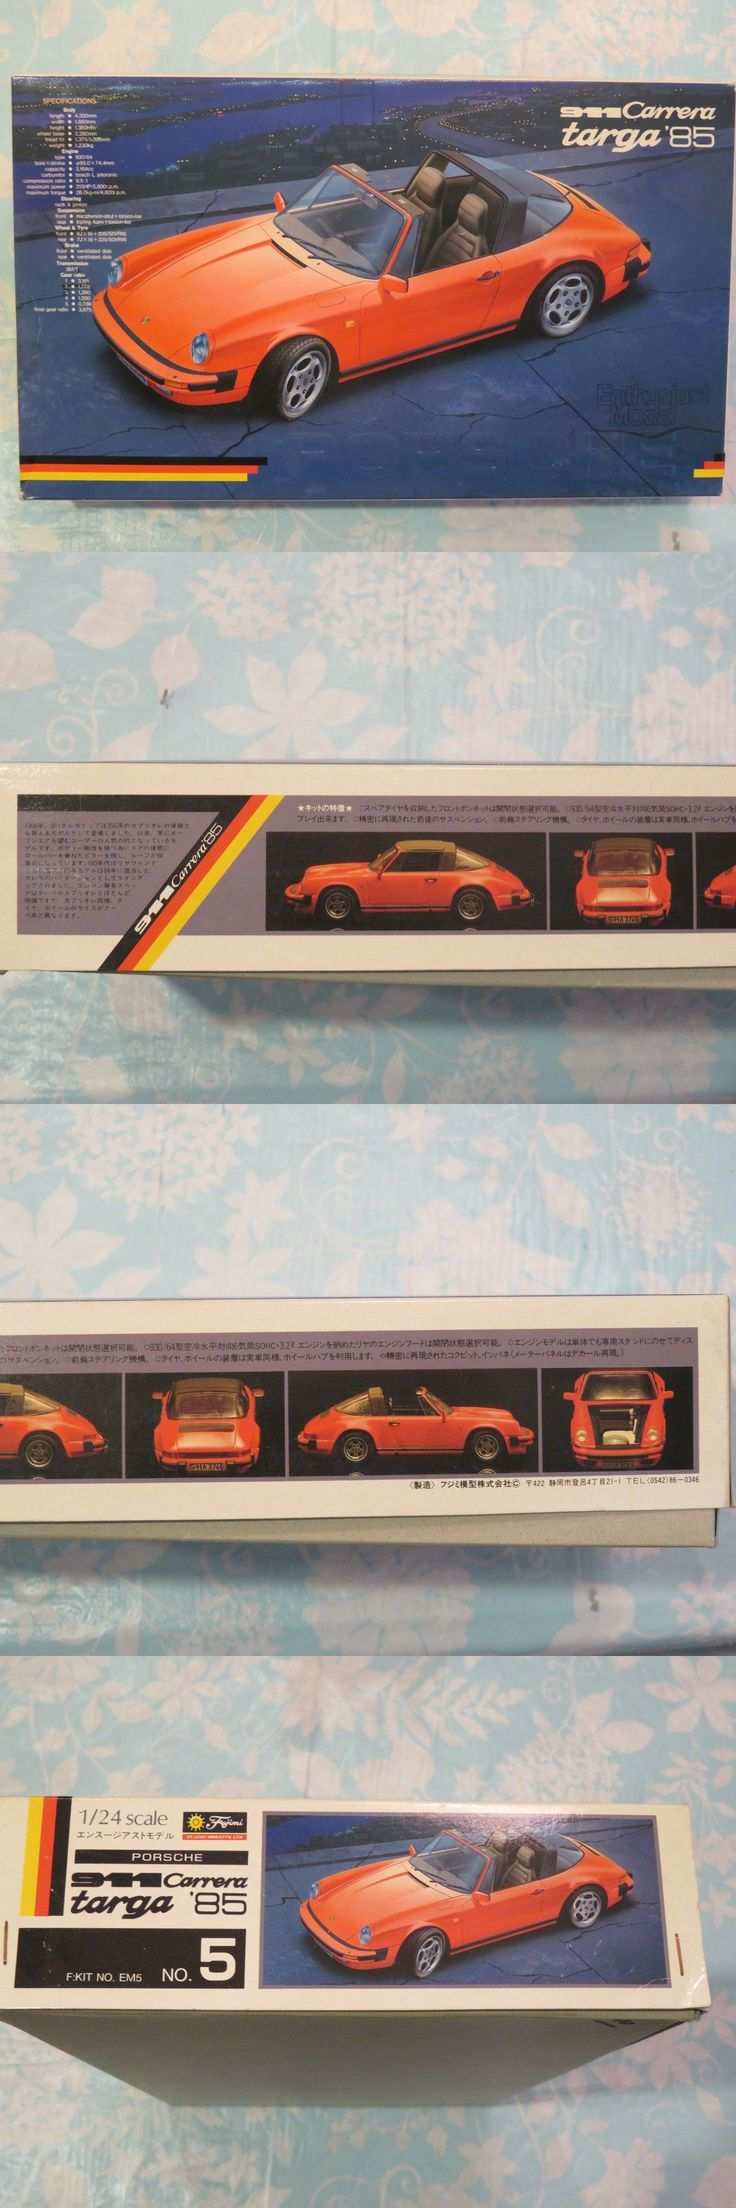 1 24 Scale 145974: Fujimi 1 24 Porsche 911 Carrera Targa 1985 Plastic Model Kit (Not Complete) -> BUY IT NOW ONLY: $37 on eBay!